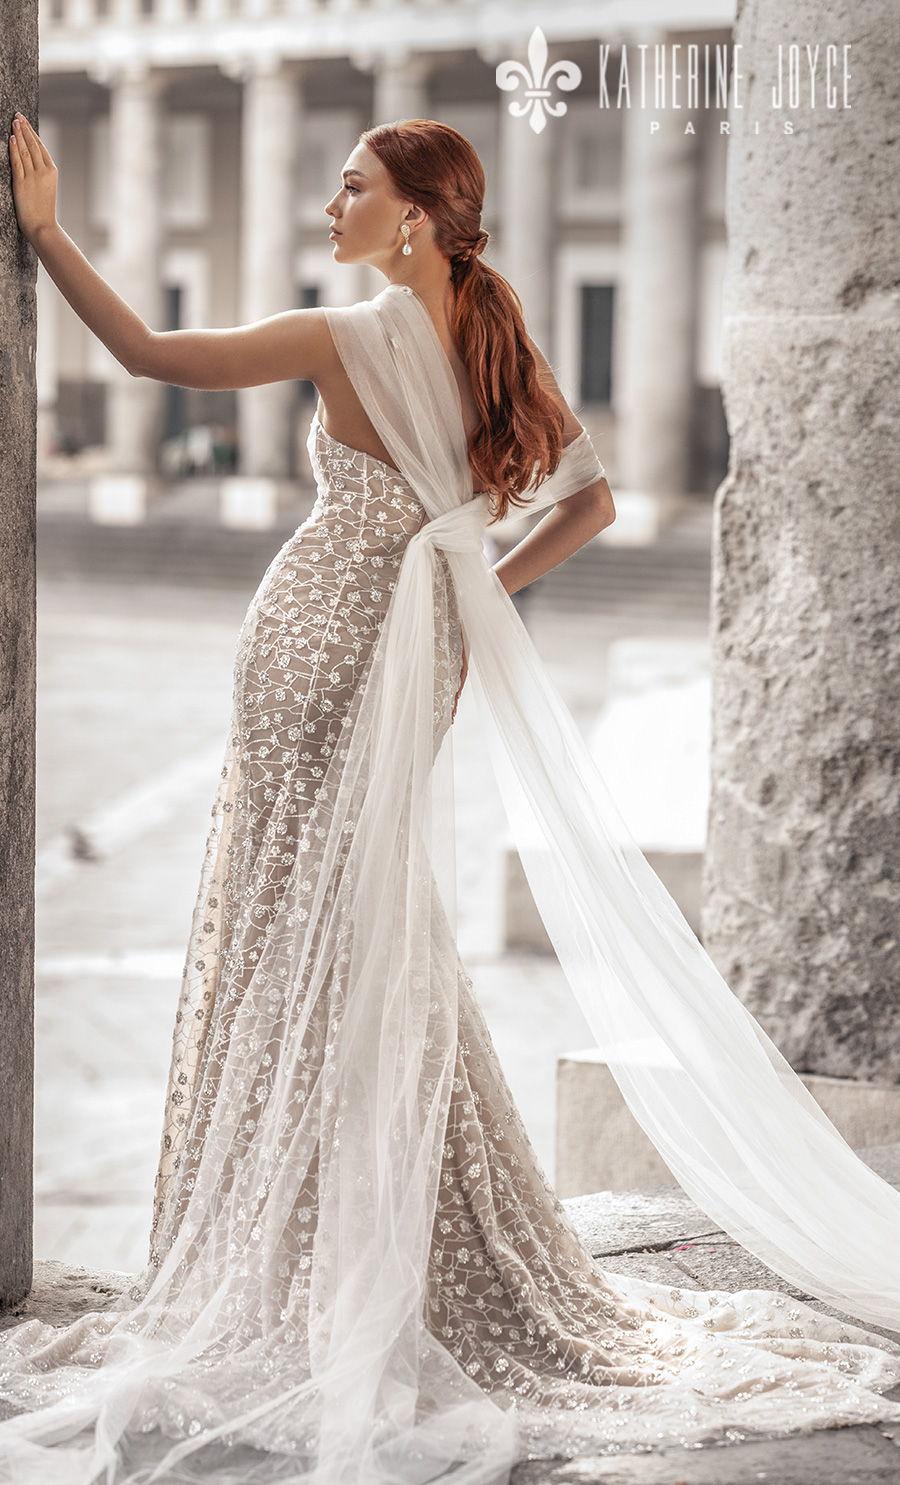 katherine joyce 2021 naples bridal one shoulder sweetheart neckline full embellishment romantic fit and flare ivory wedding dress mid back medium train (zarina) bv